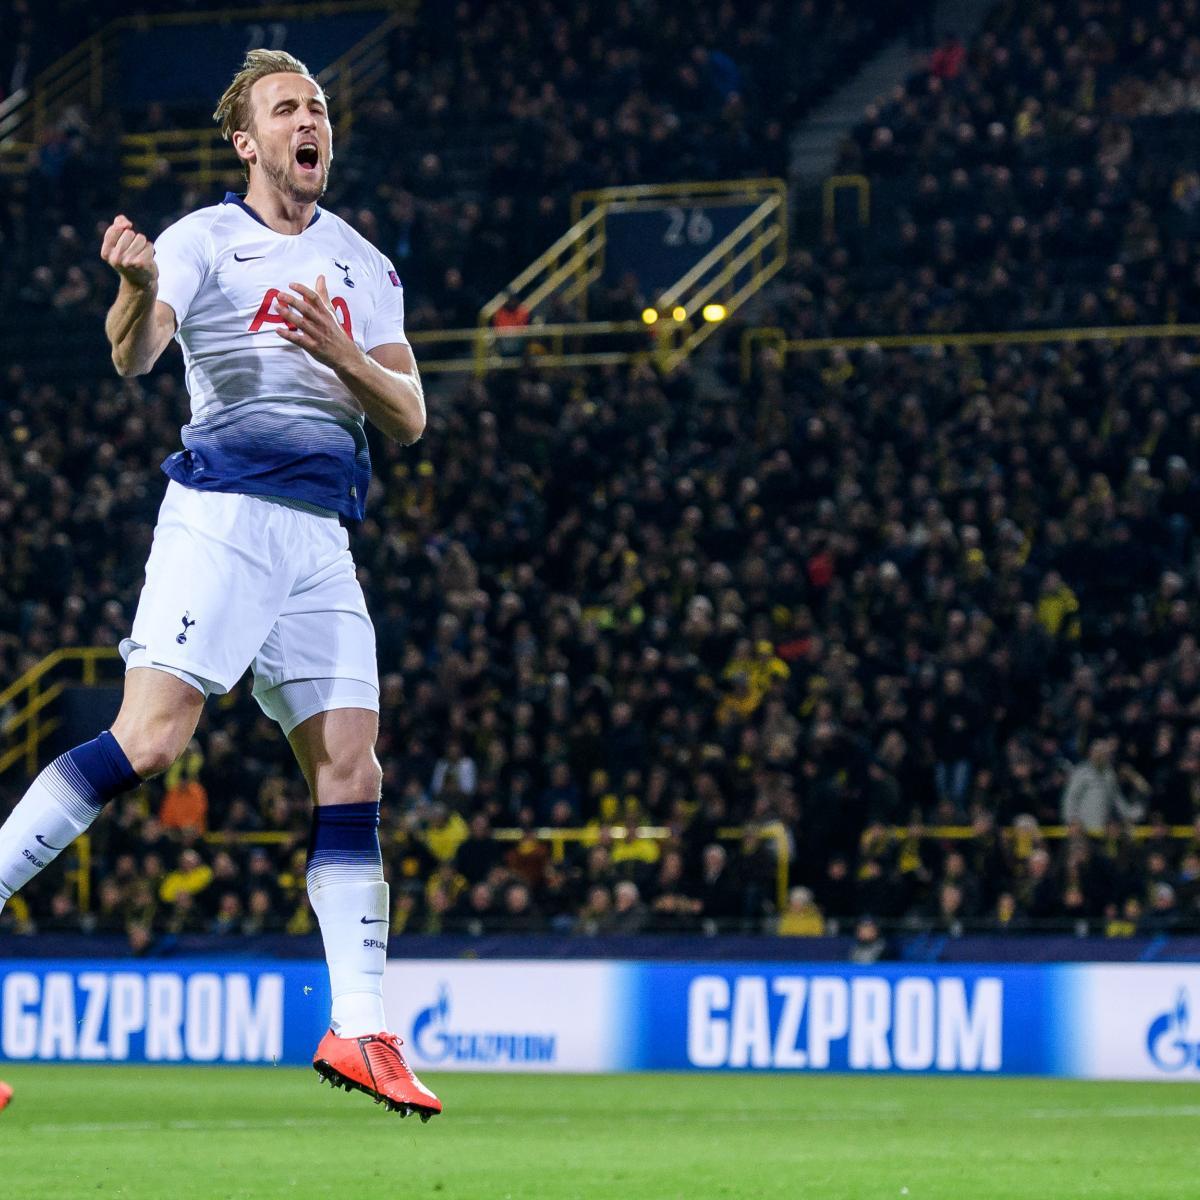 Tottenham 3 Fulham 1 Match Highlights Harry Kane Scores: Roman Burki Praises 'Beast' Harry Kane After Tottenham's